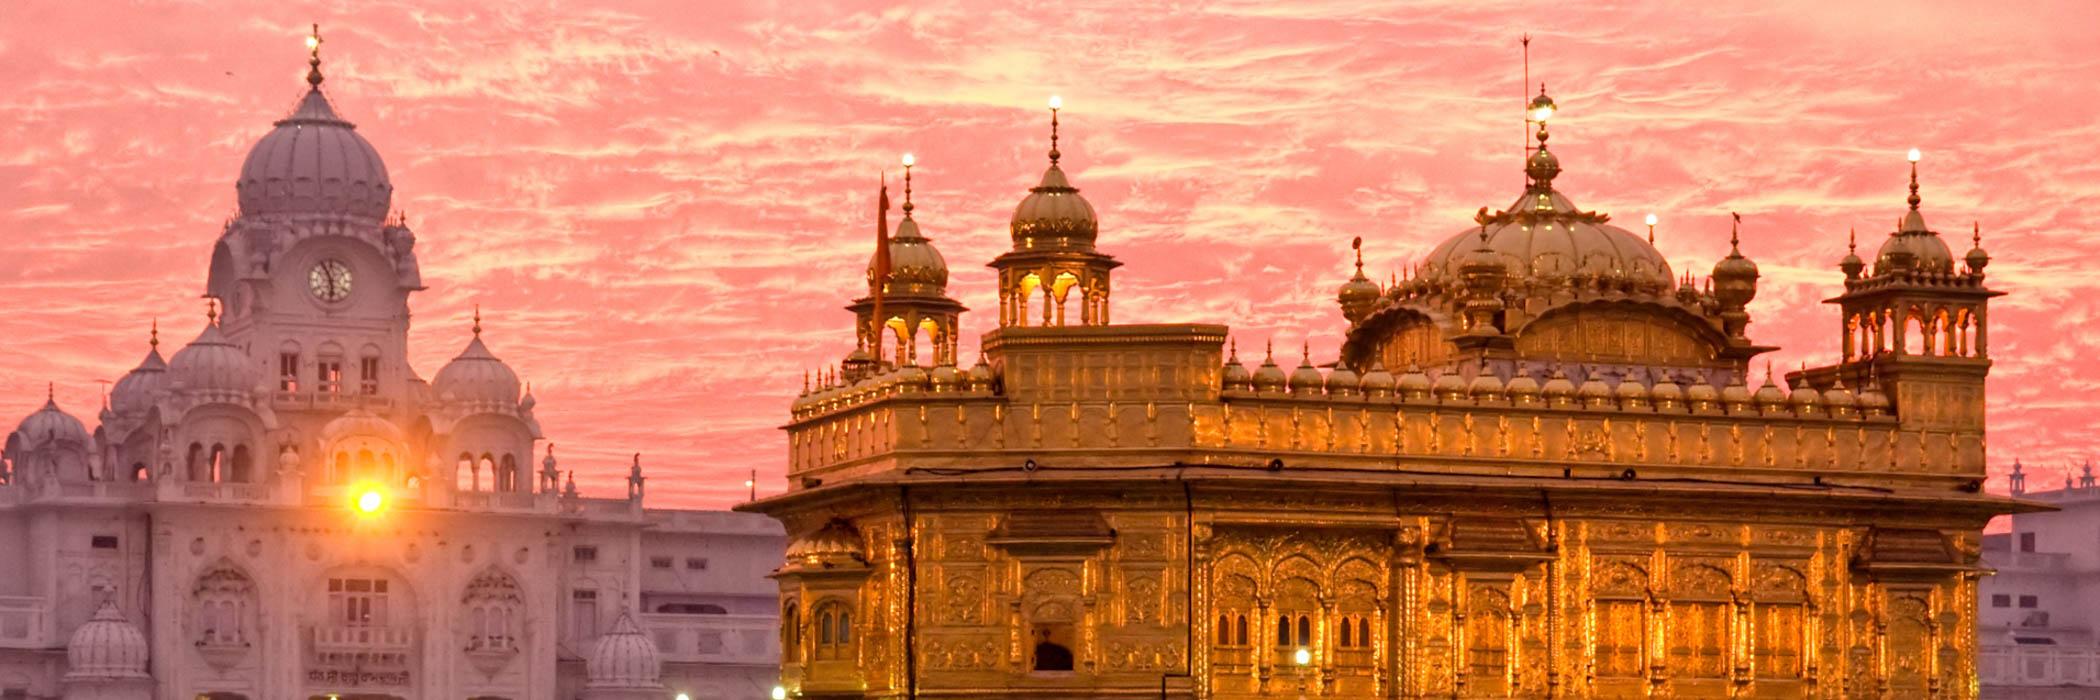 Golden Temple at sunset, Amritsar, Punjab, India.